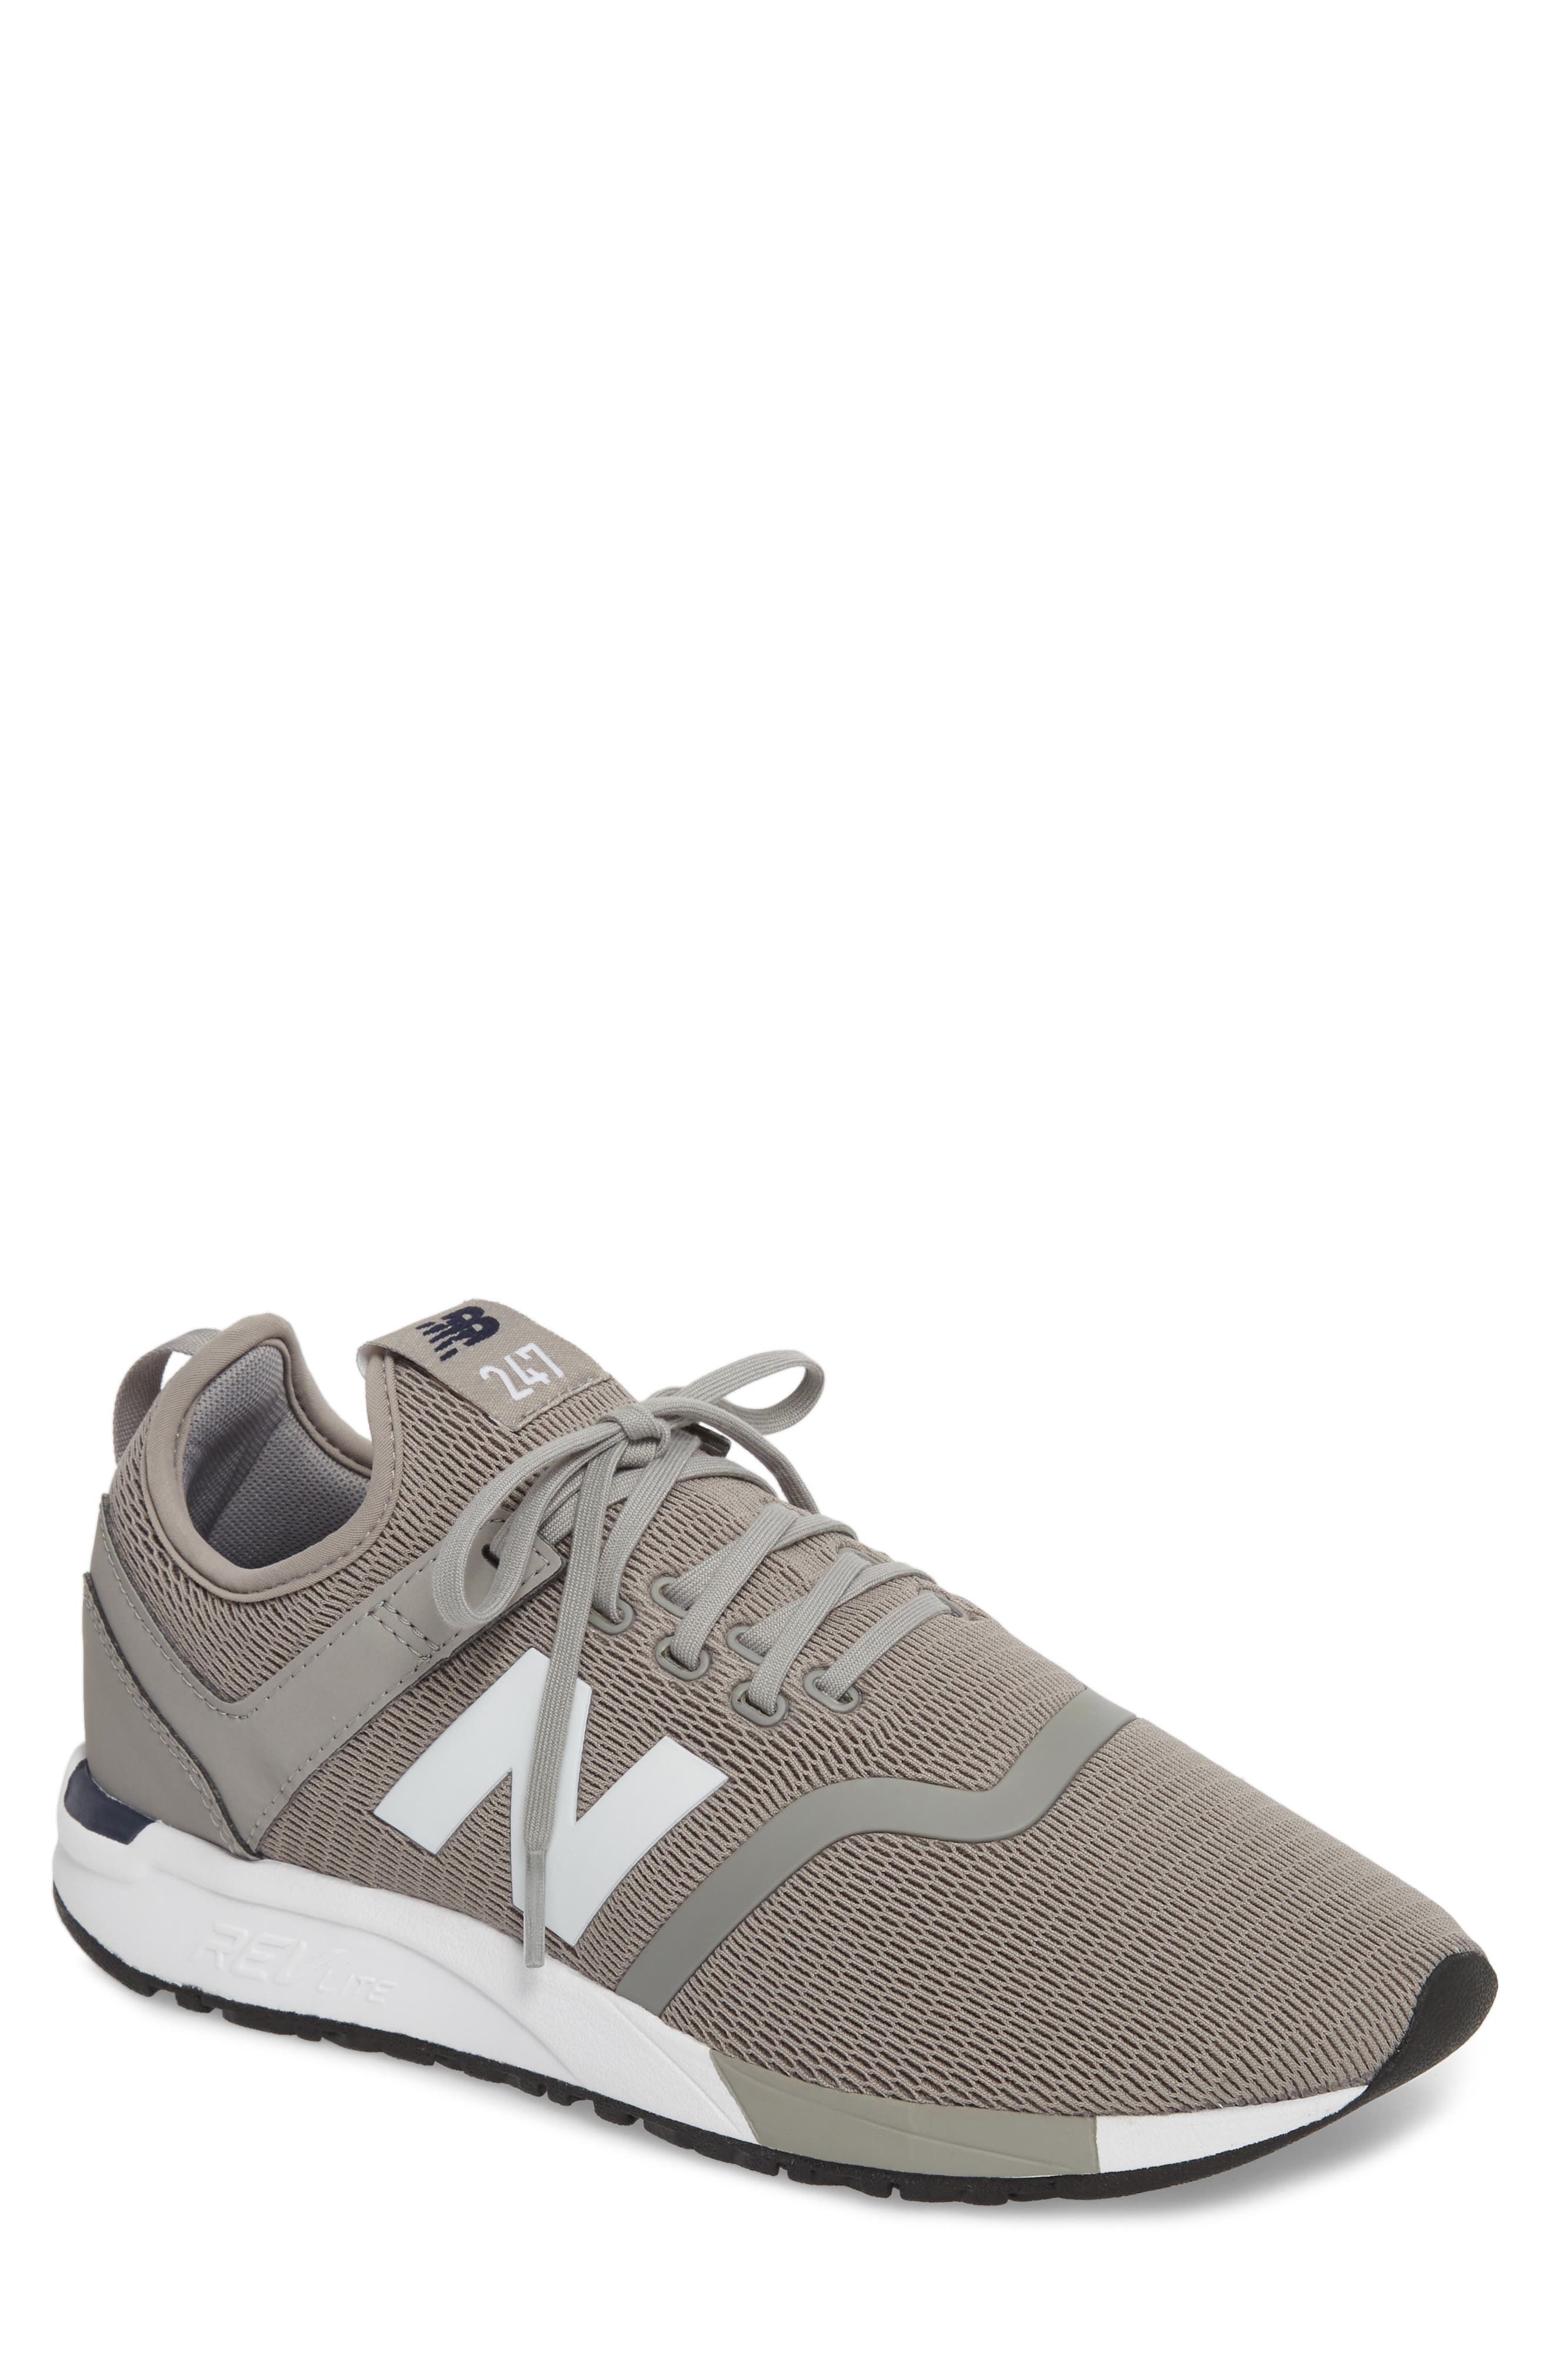 247 Sneaker,                             Main thumbnail 1, color,                             Steel